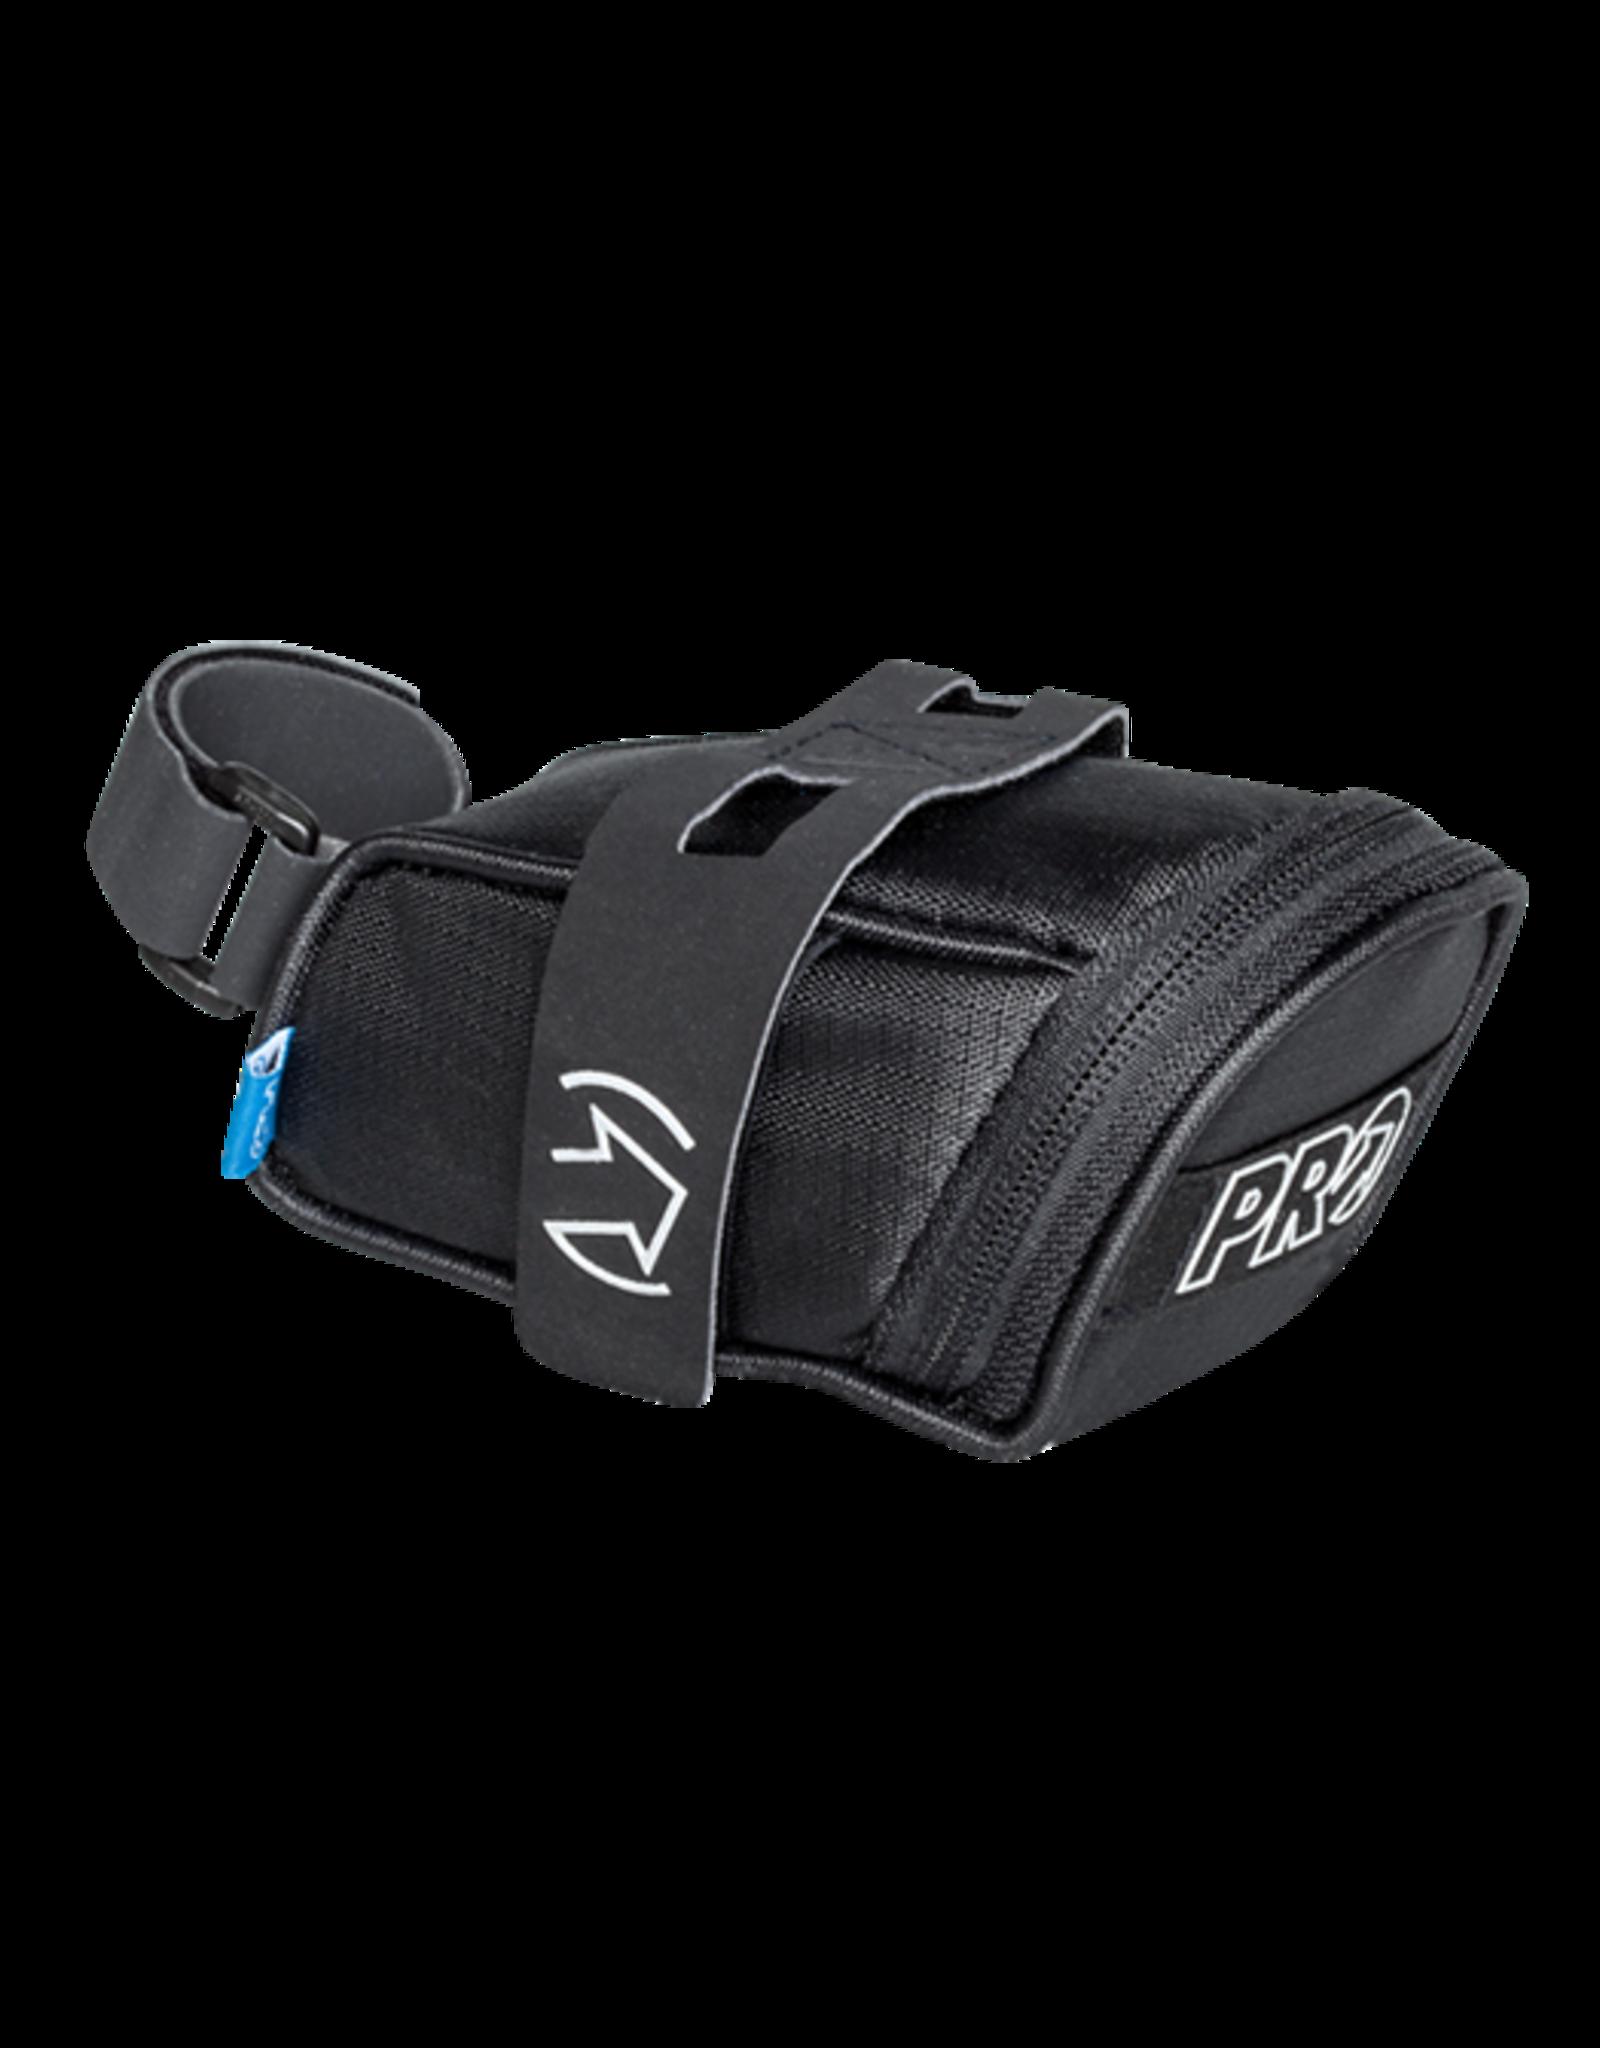 Pro Maxi Saddlebag Black Strap System 1.0L MY16